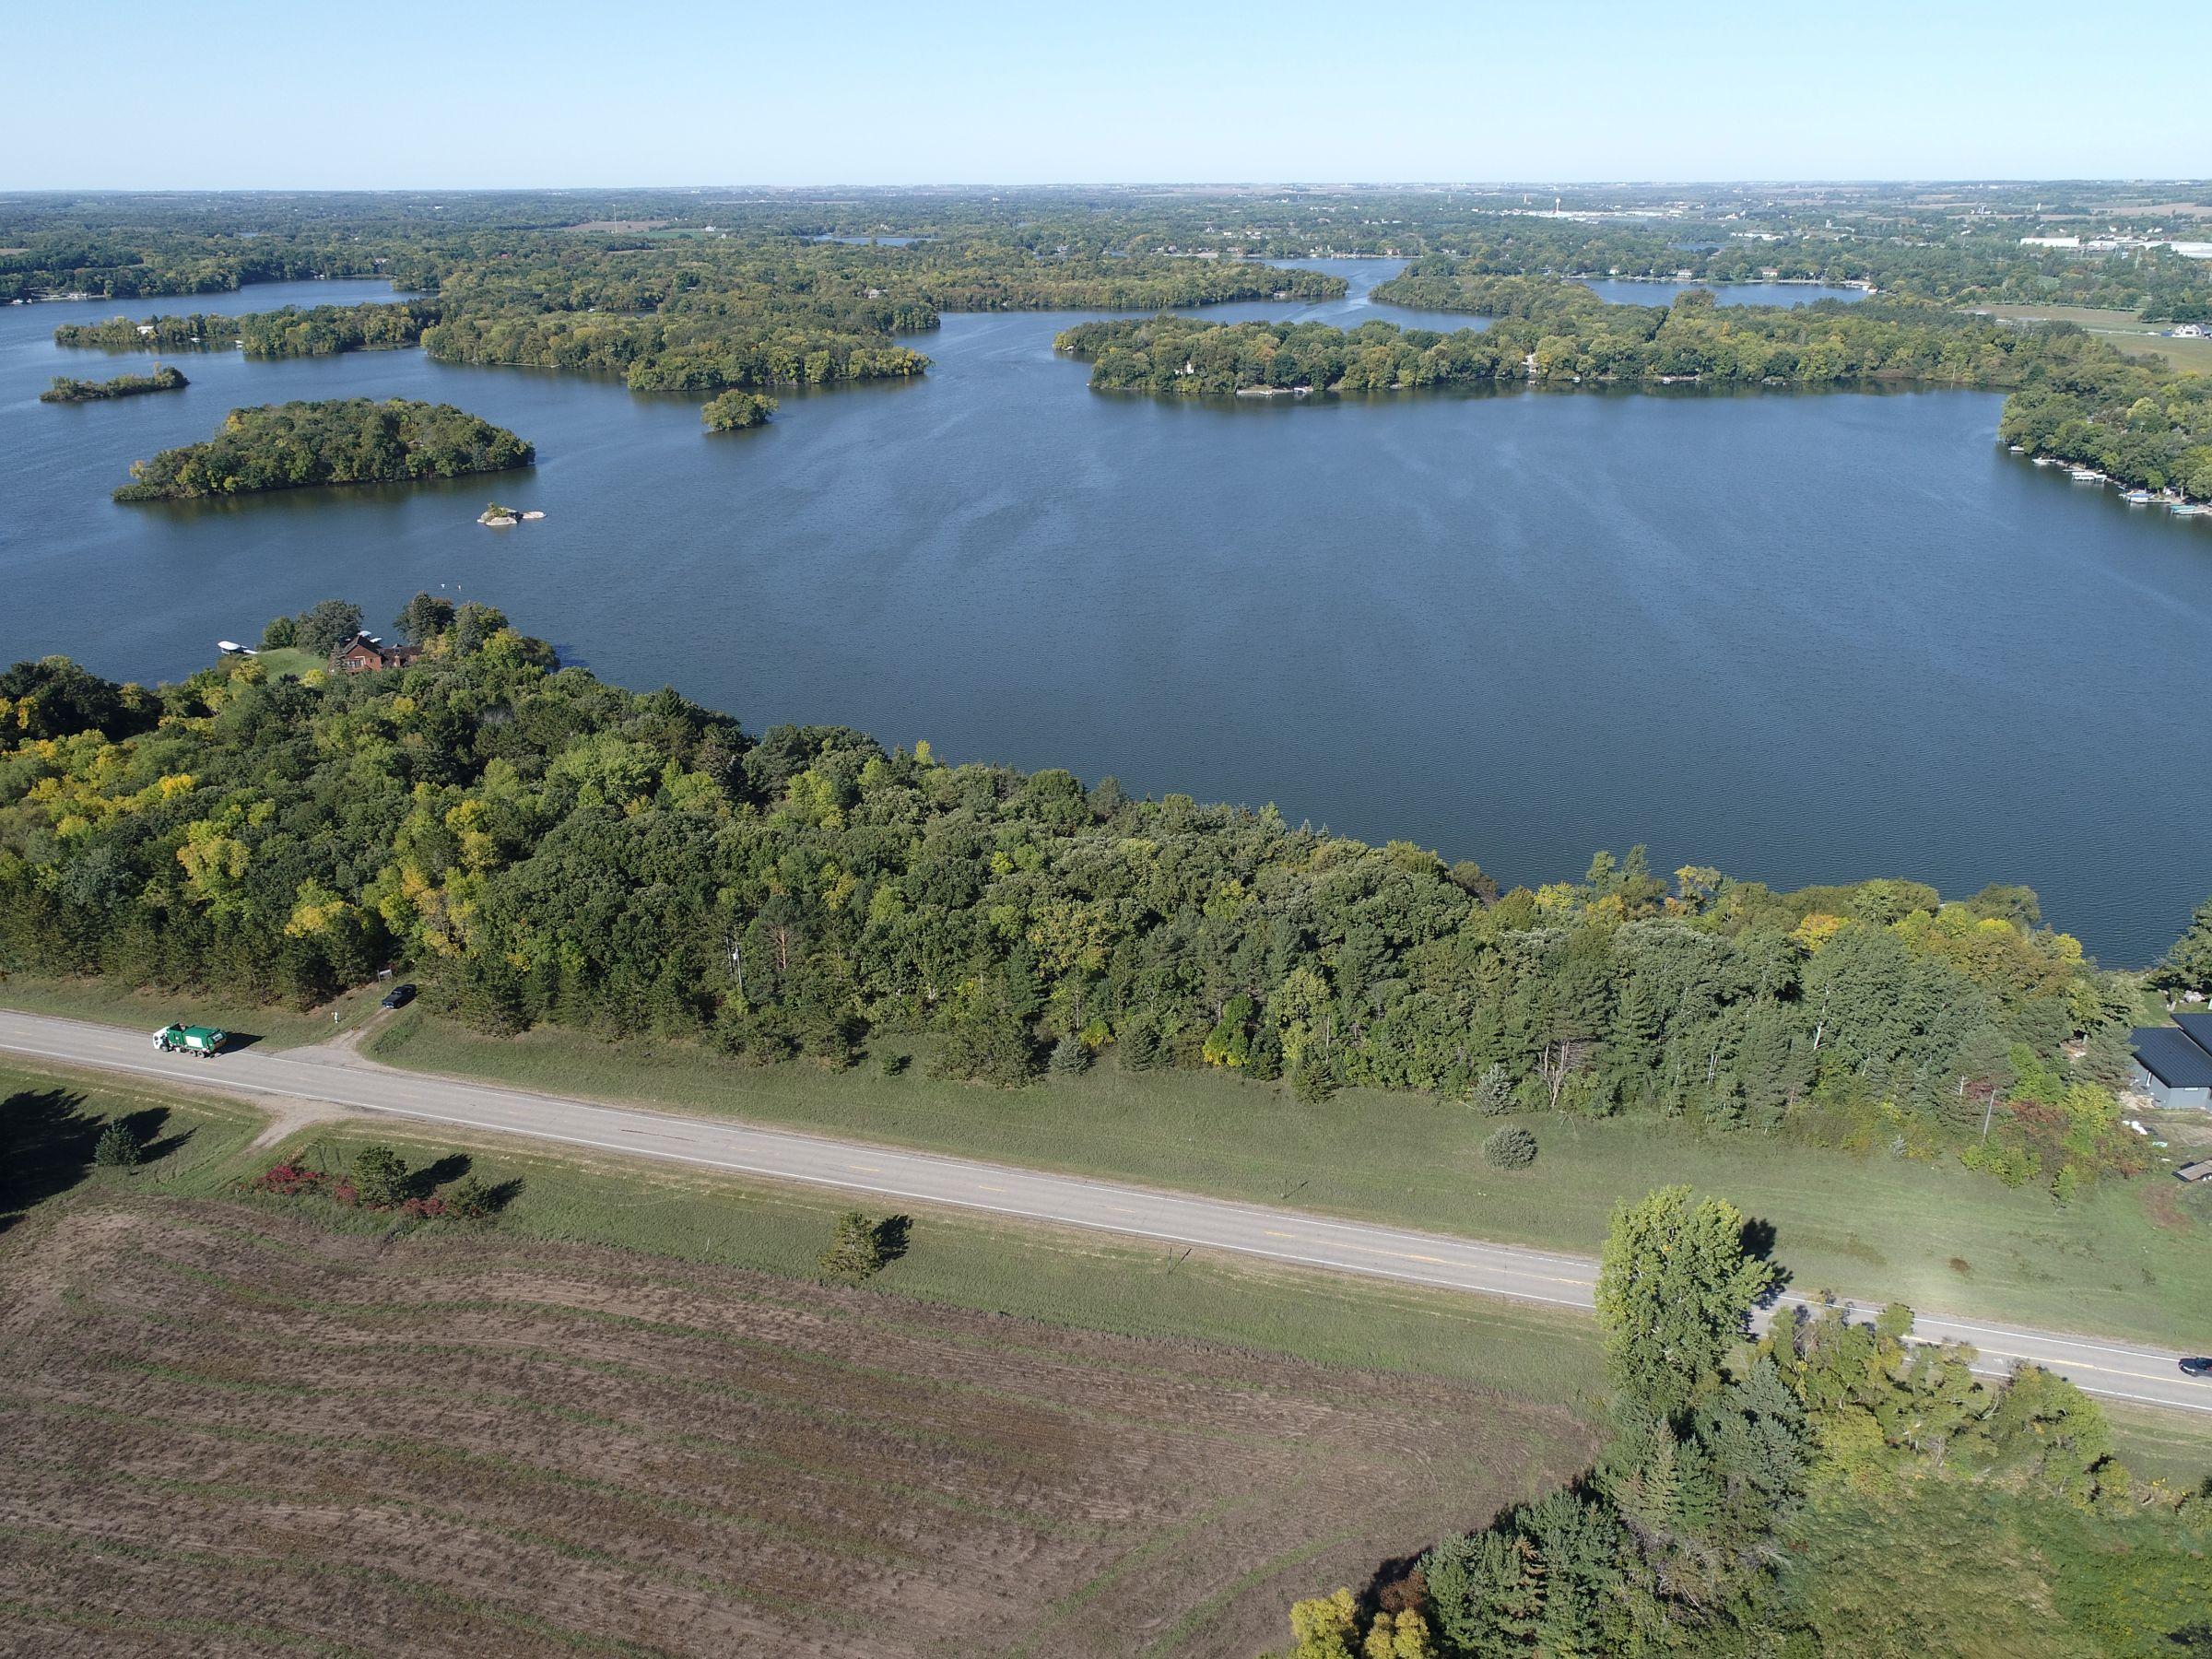 land-stearns-county-minnesota-298-acres-listing-number-15712-1-2021-09-23-131313.JPG